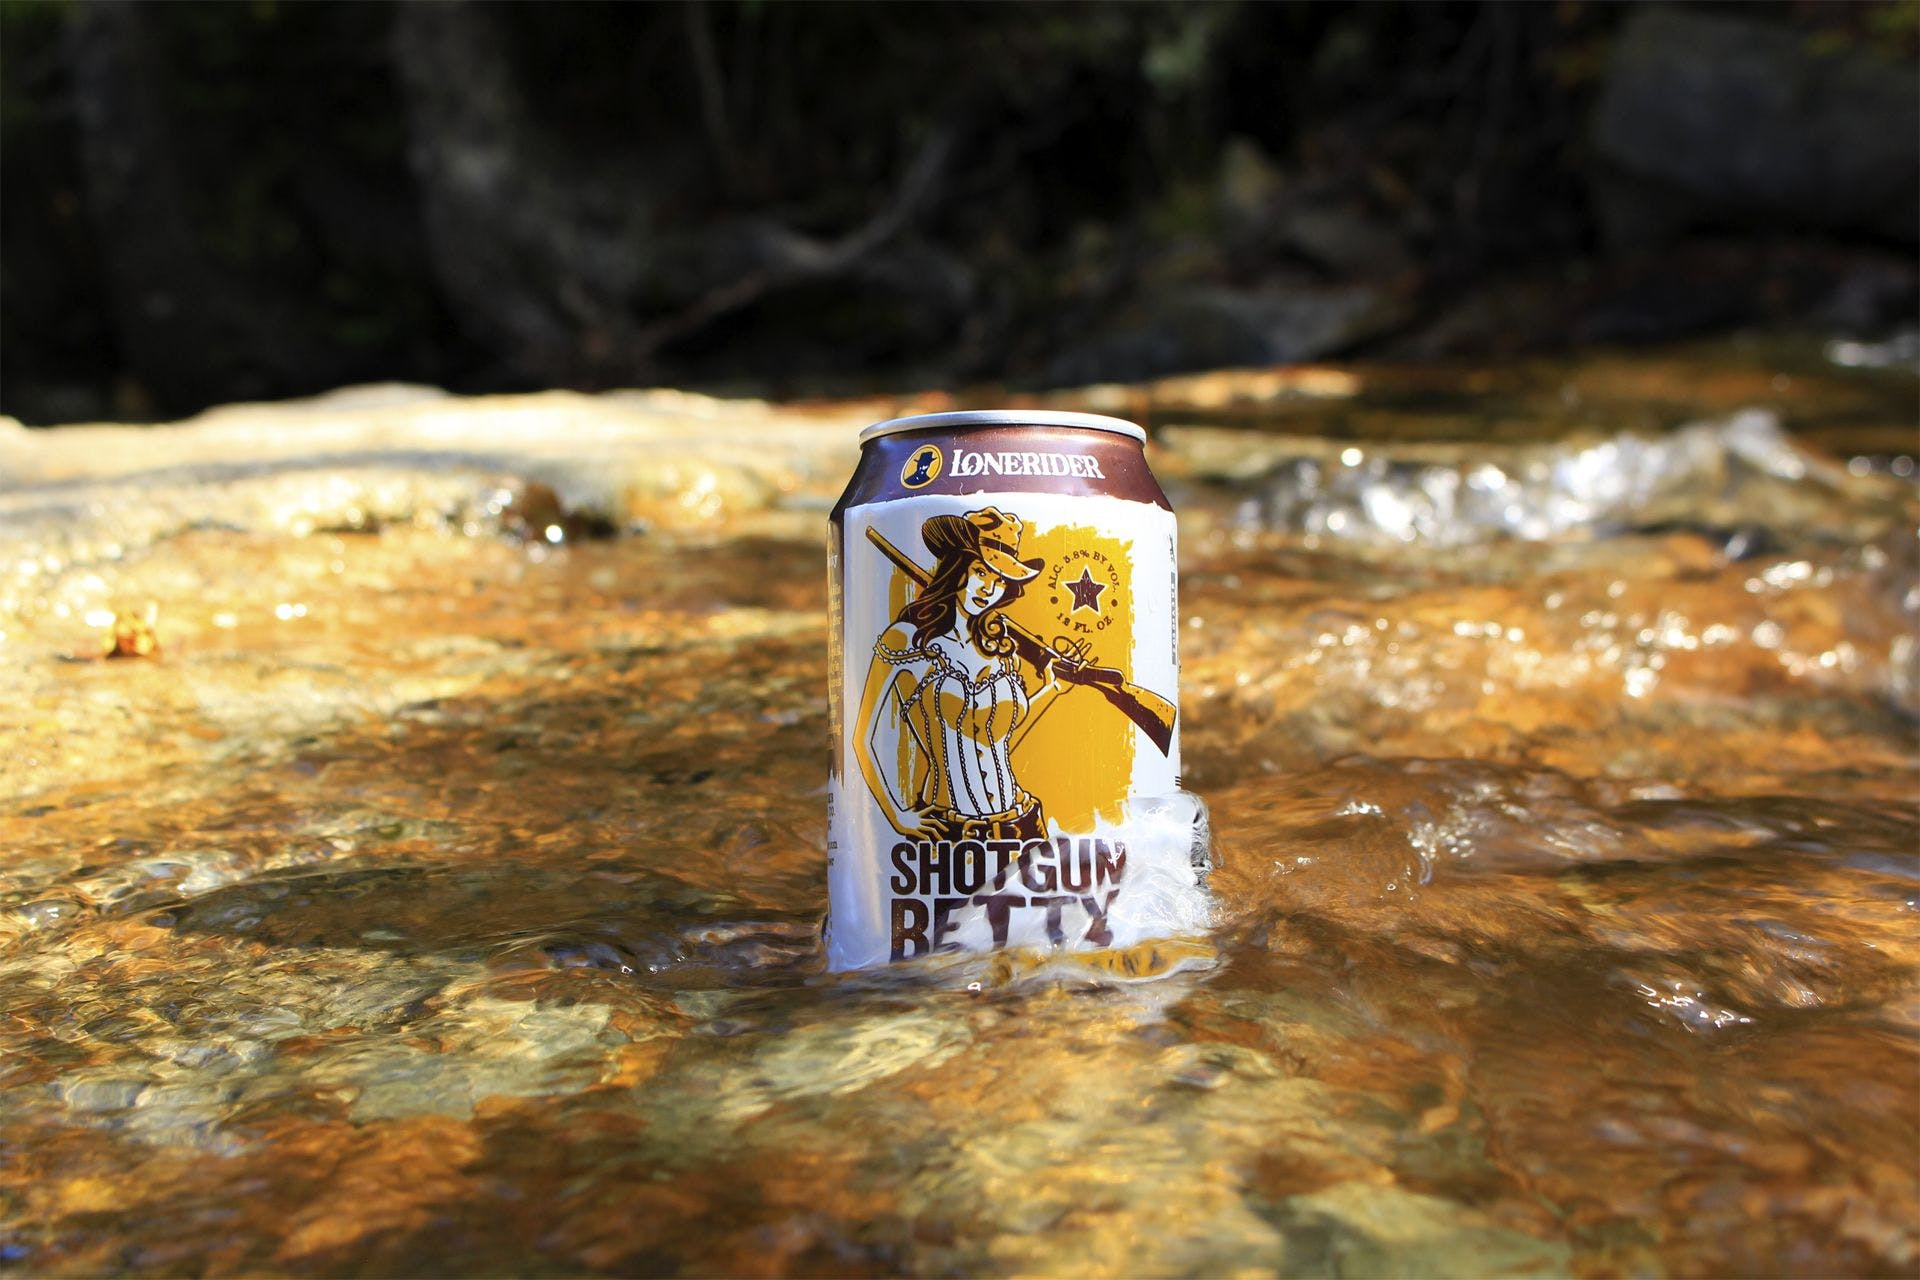 Lonerider Brewing Company - Shotgun Betty Hefeweizen